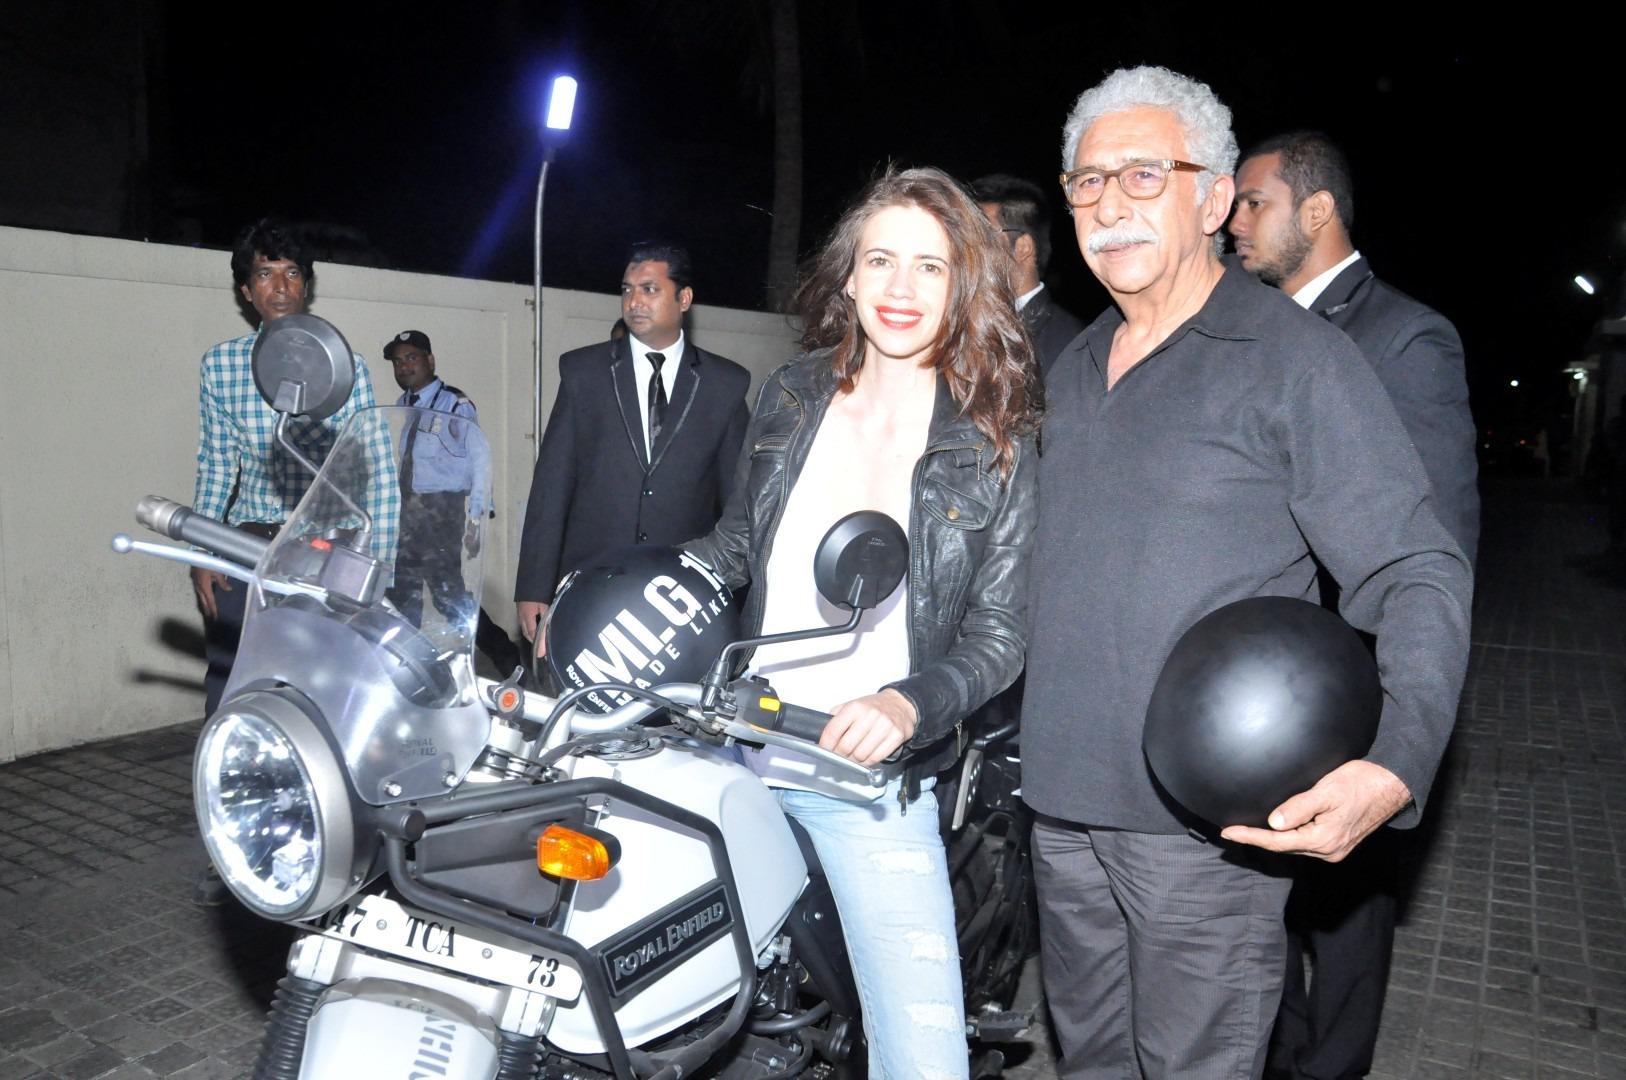 Naseeruddin Shah & Kalki Koechlin At Screening Of Film Waiting Exclusive Stills